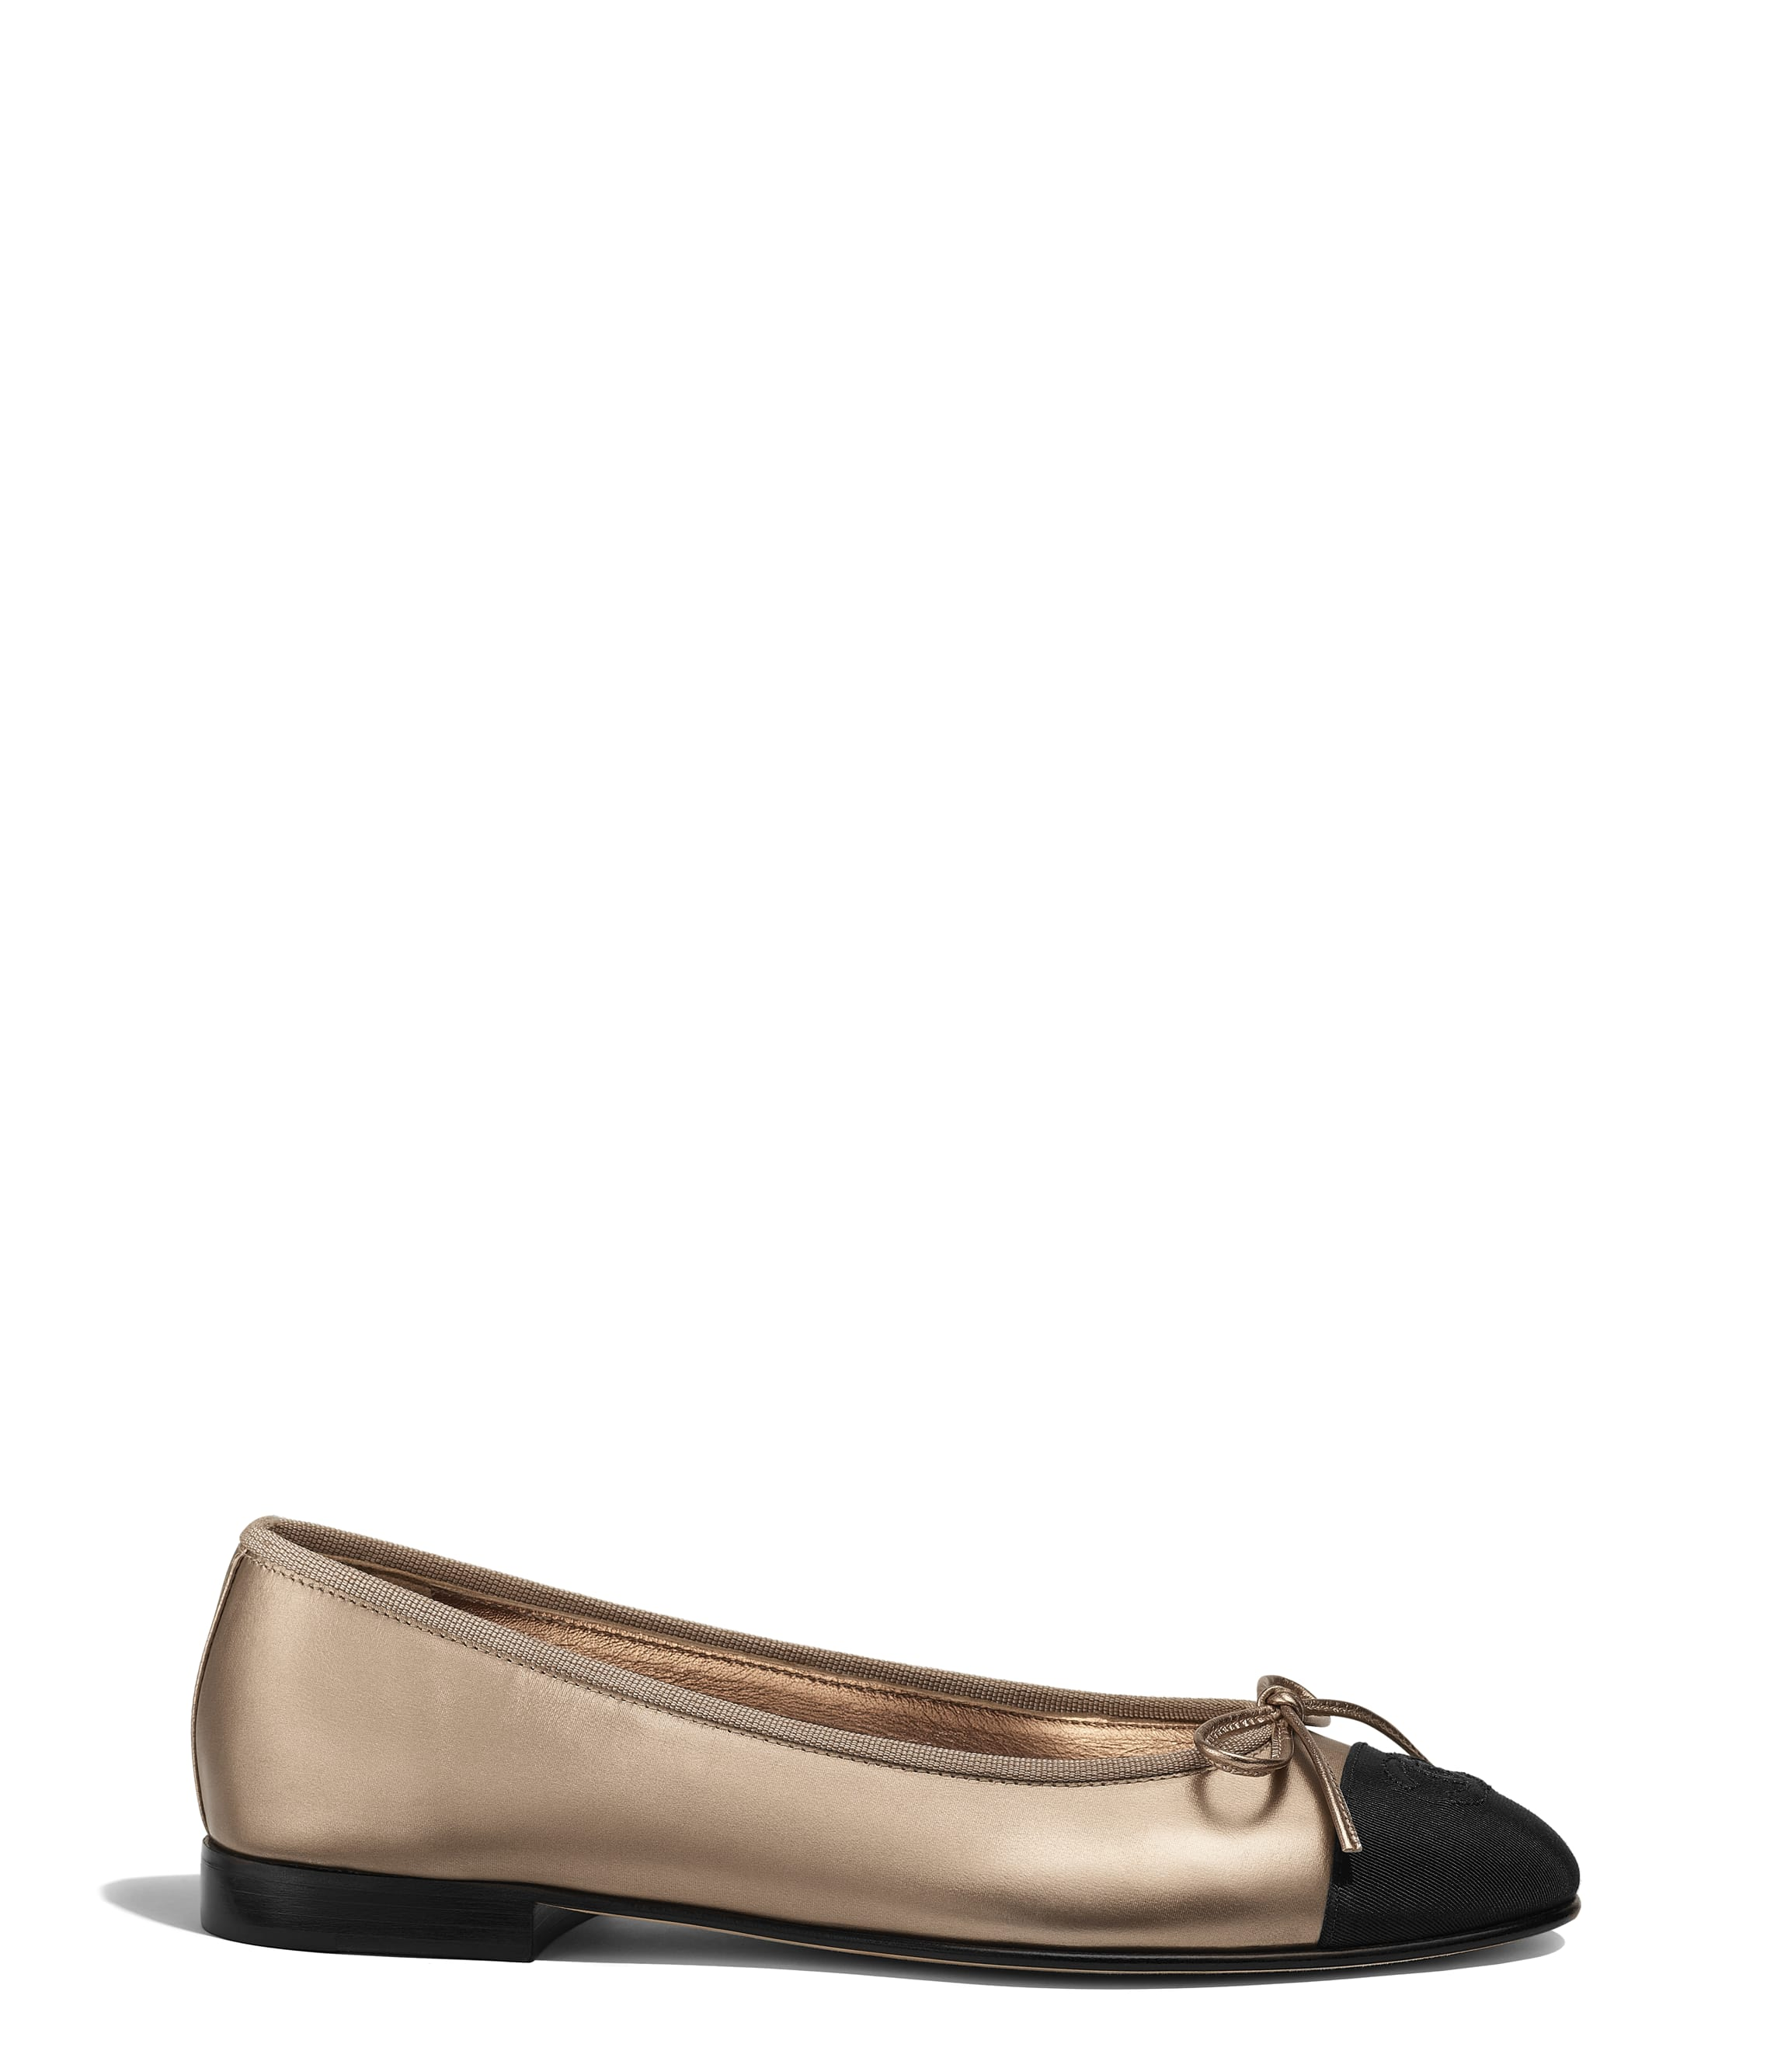 cda88464c97 Ballerinas - Shoes - CHANEL